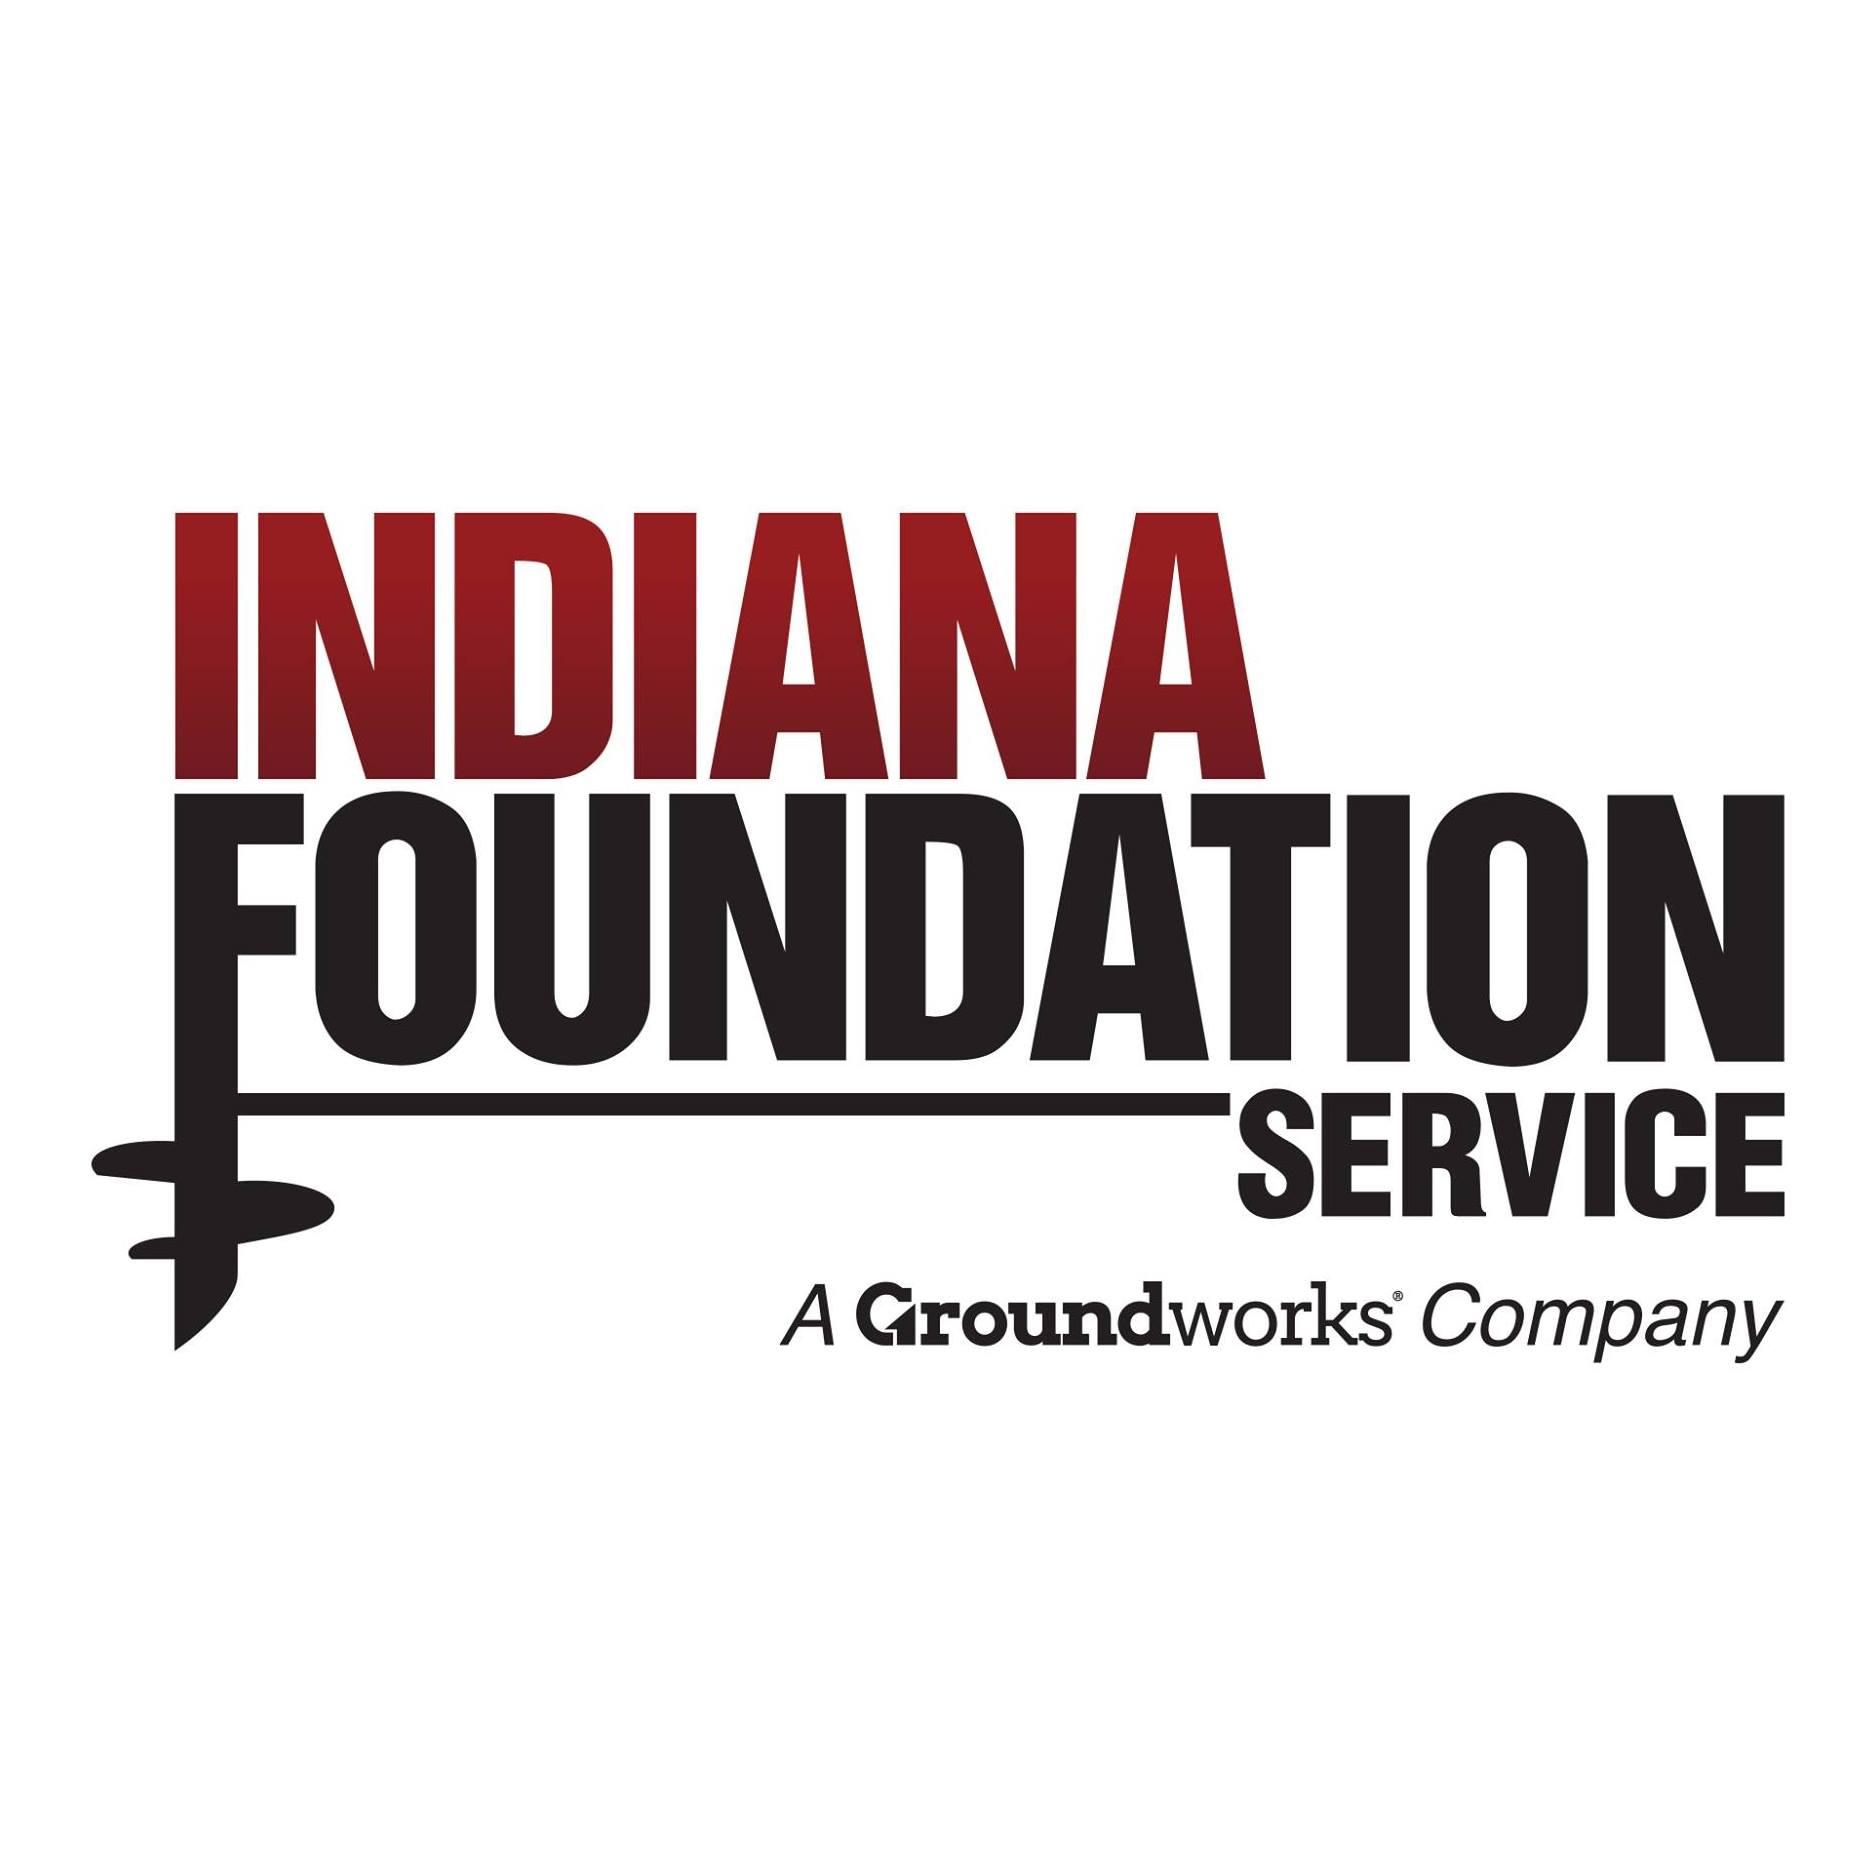 Indiana Foundation Service